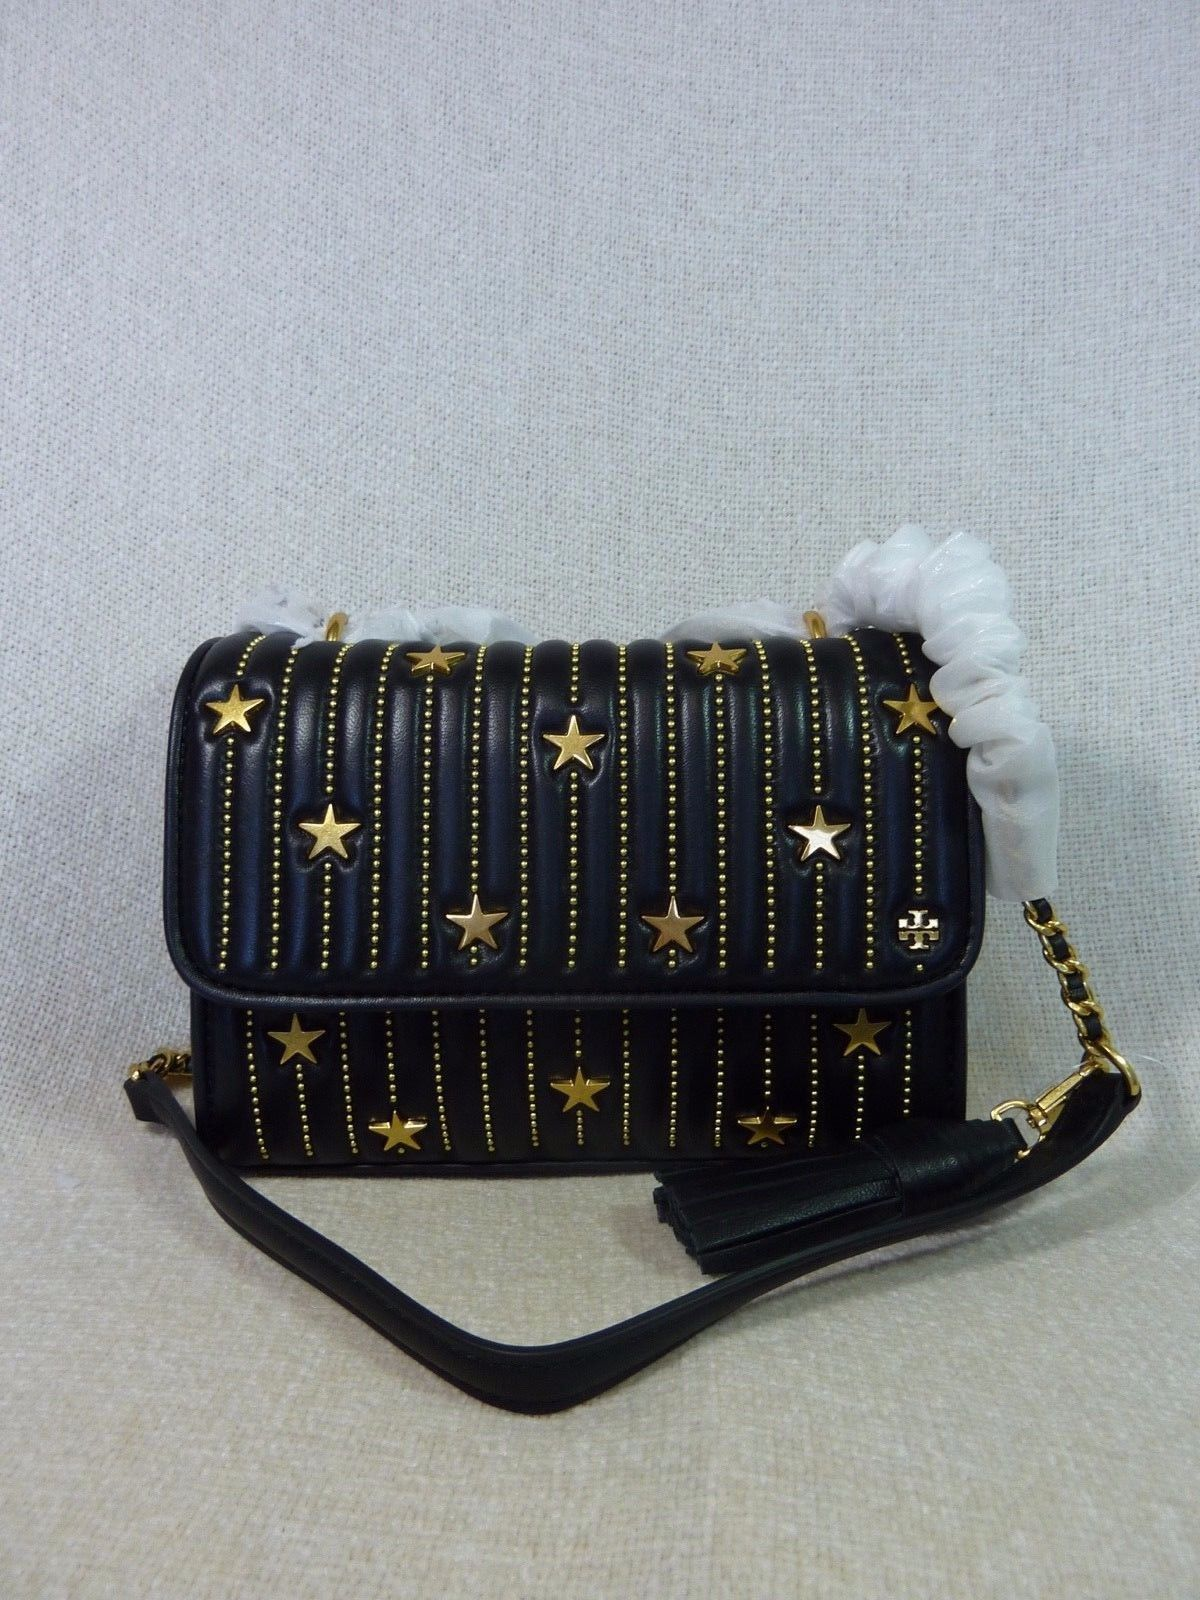 NWT Tory Burch Black Fleming Star-Stud Small Convertible Bag $558